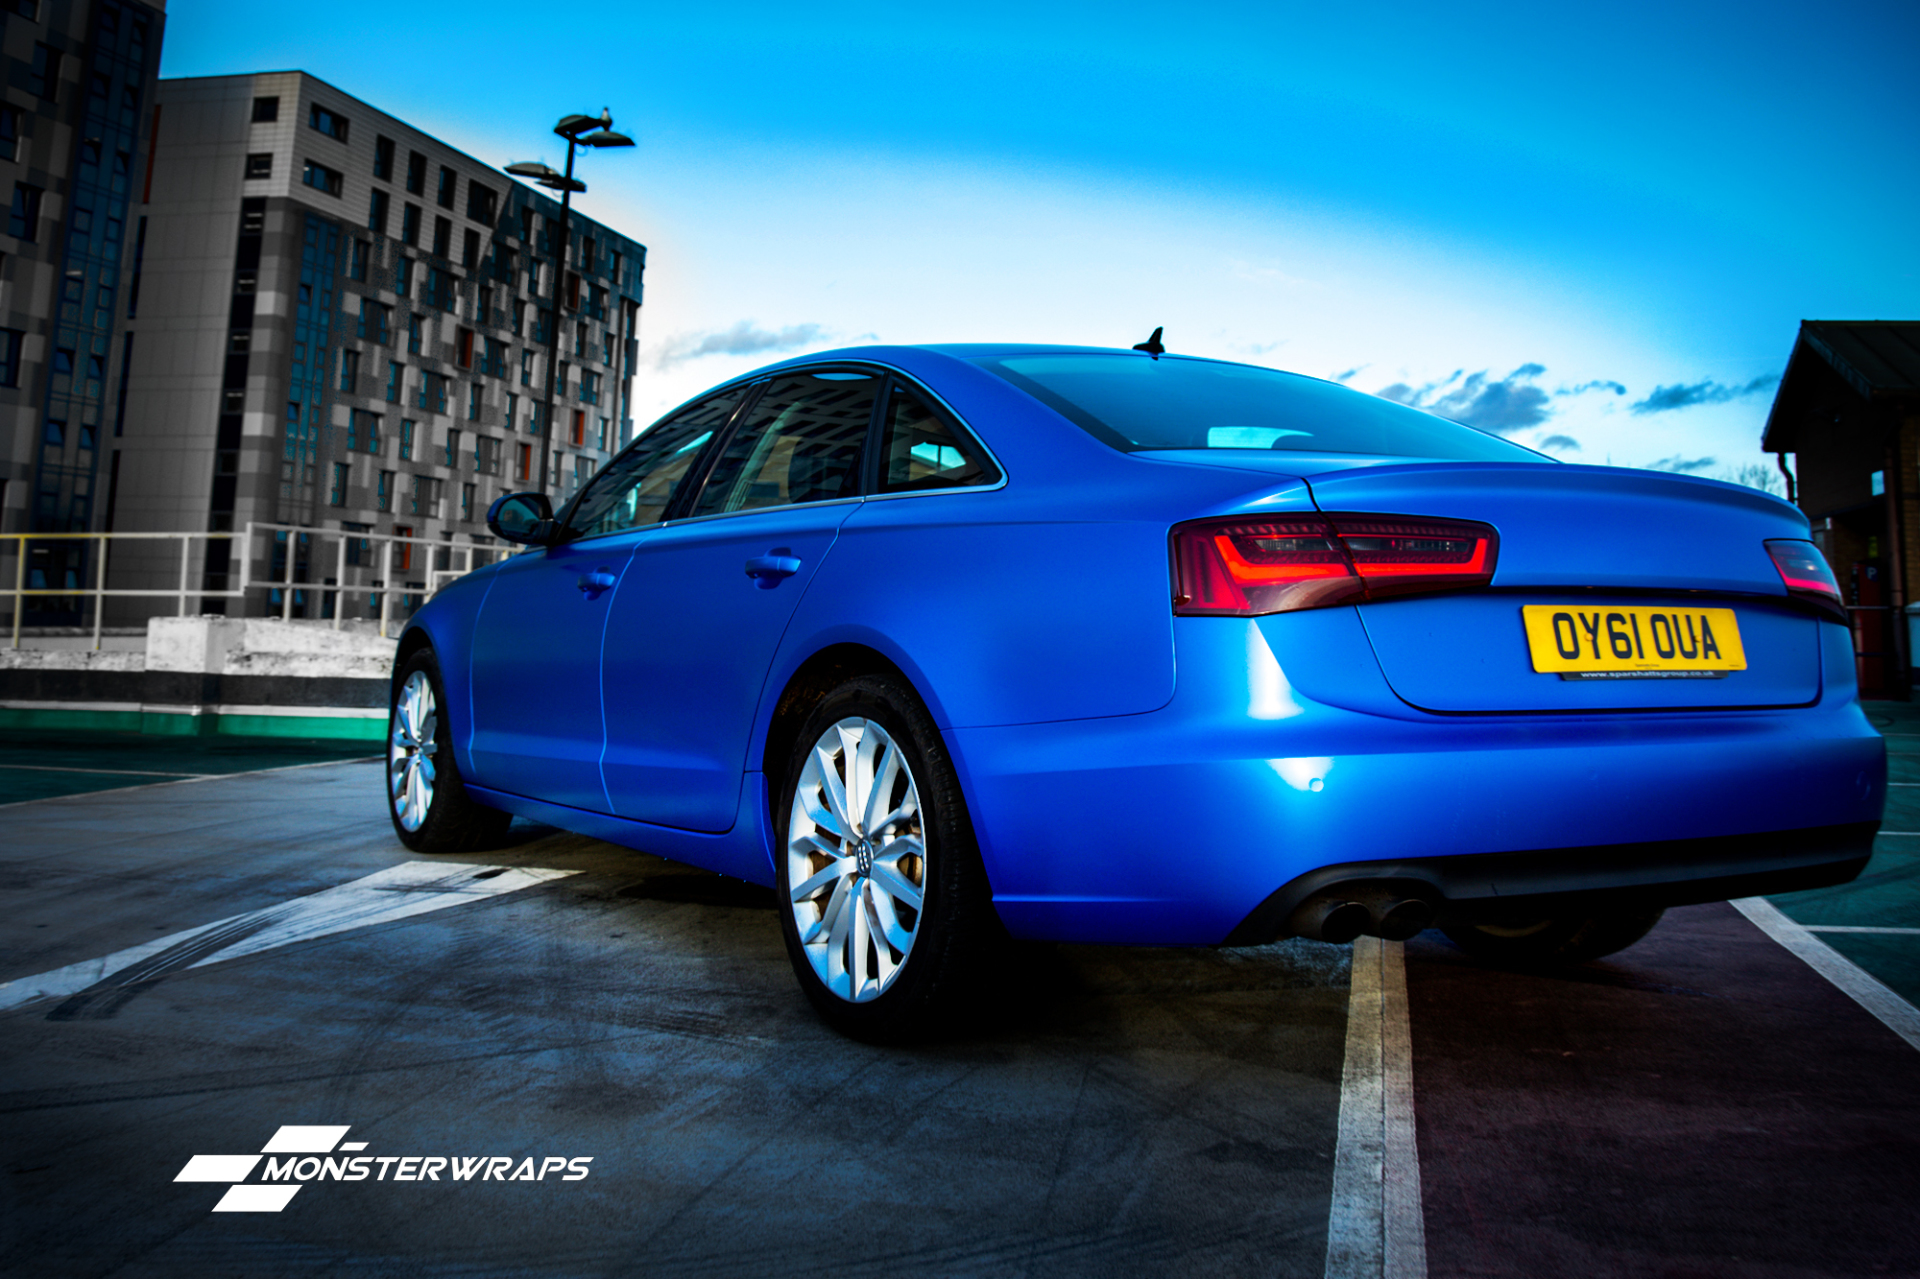 Audi A6 Satin perfect blue full wrap